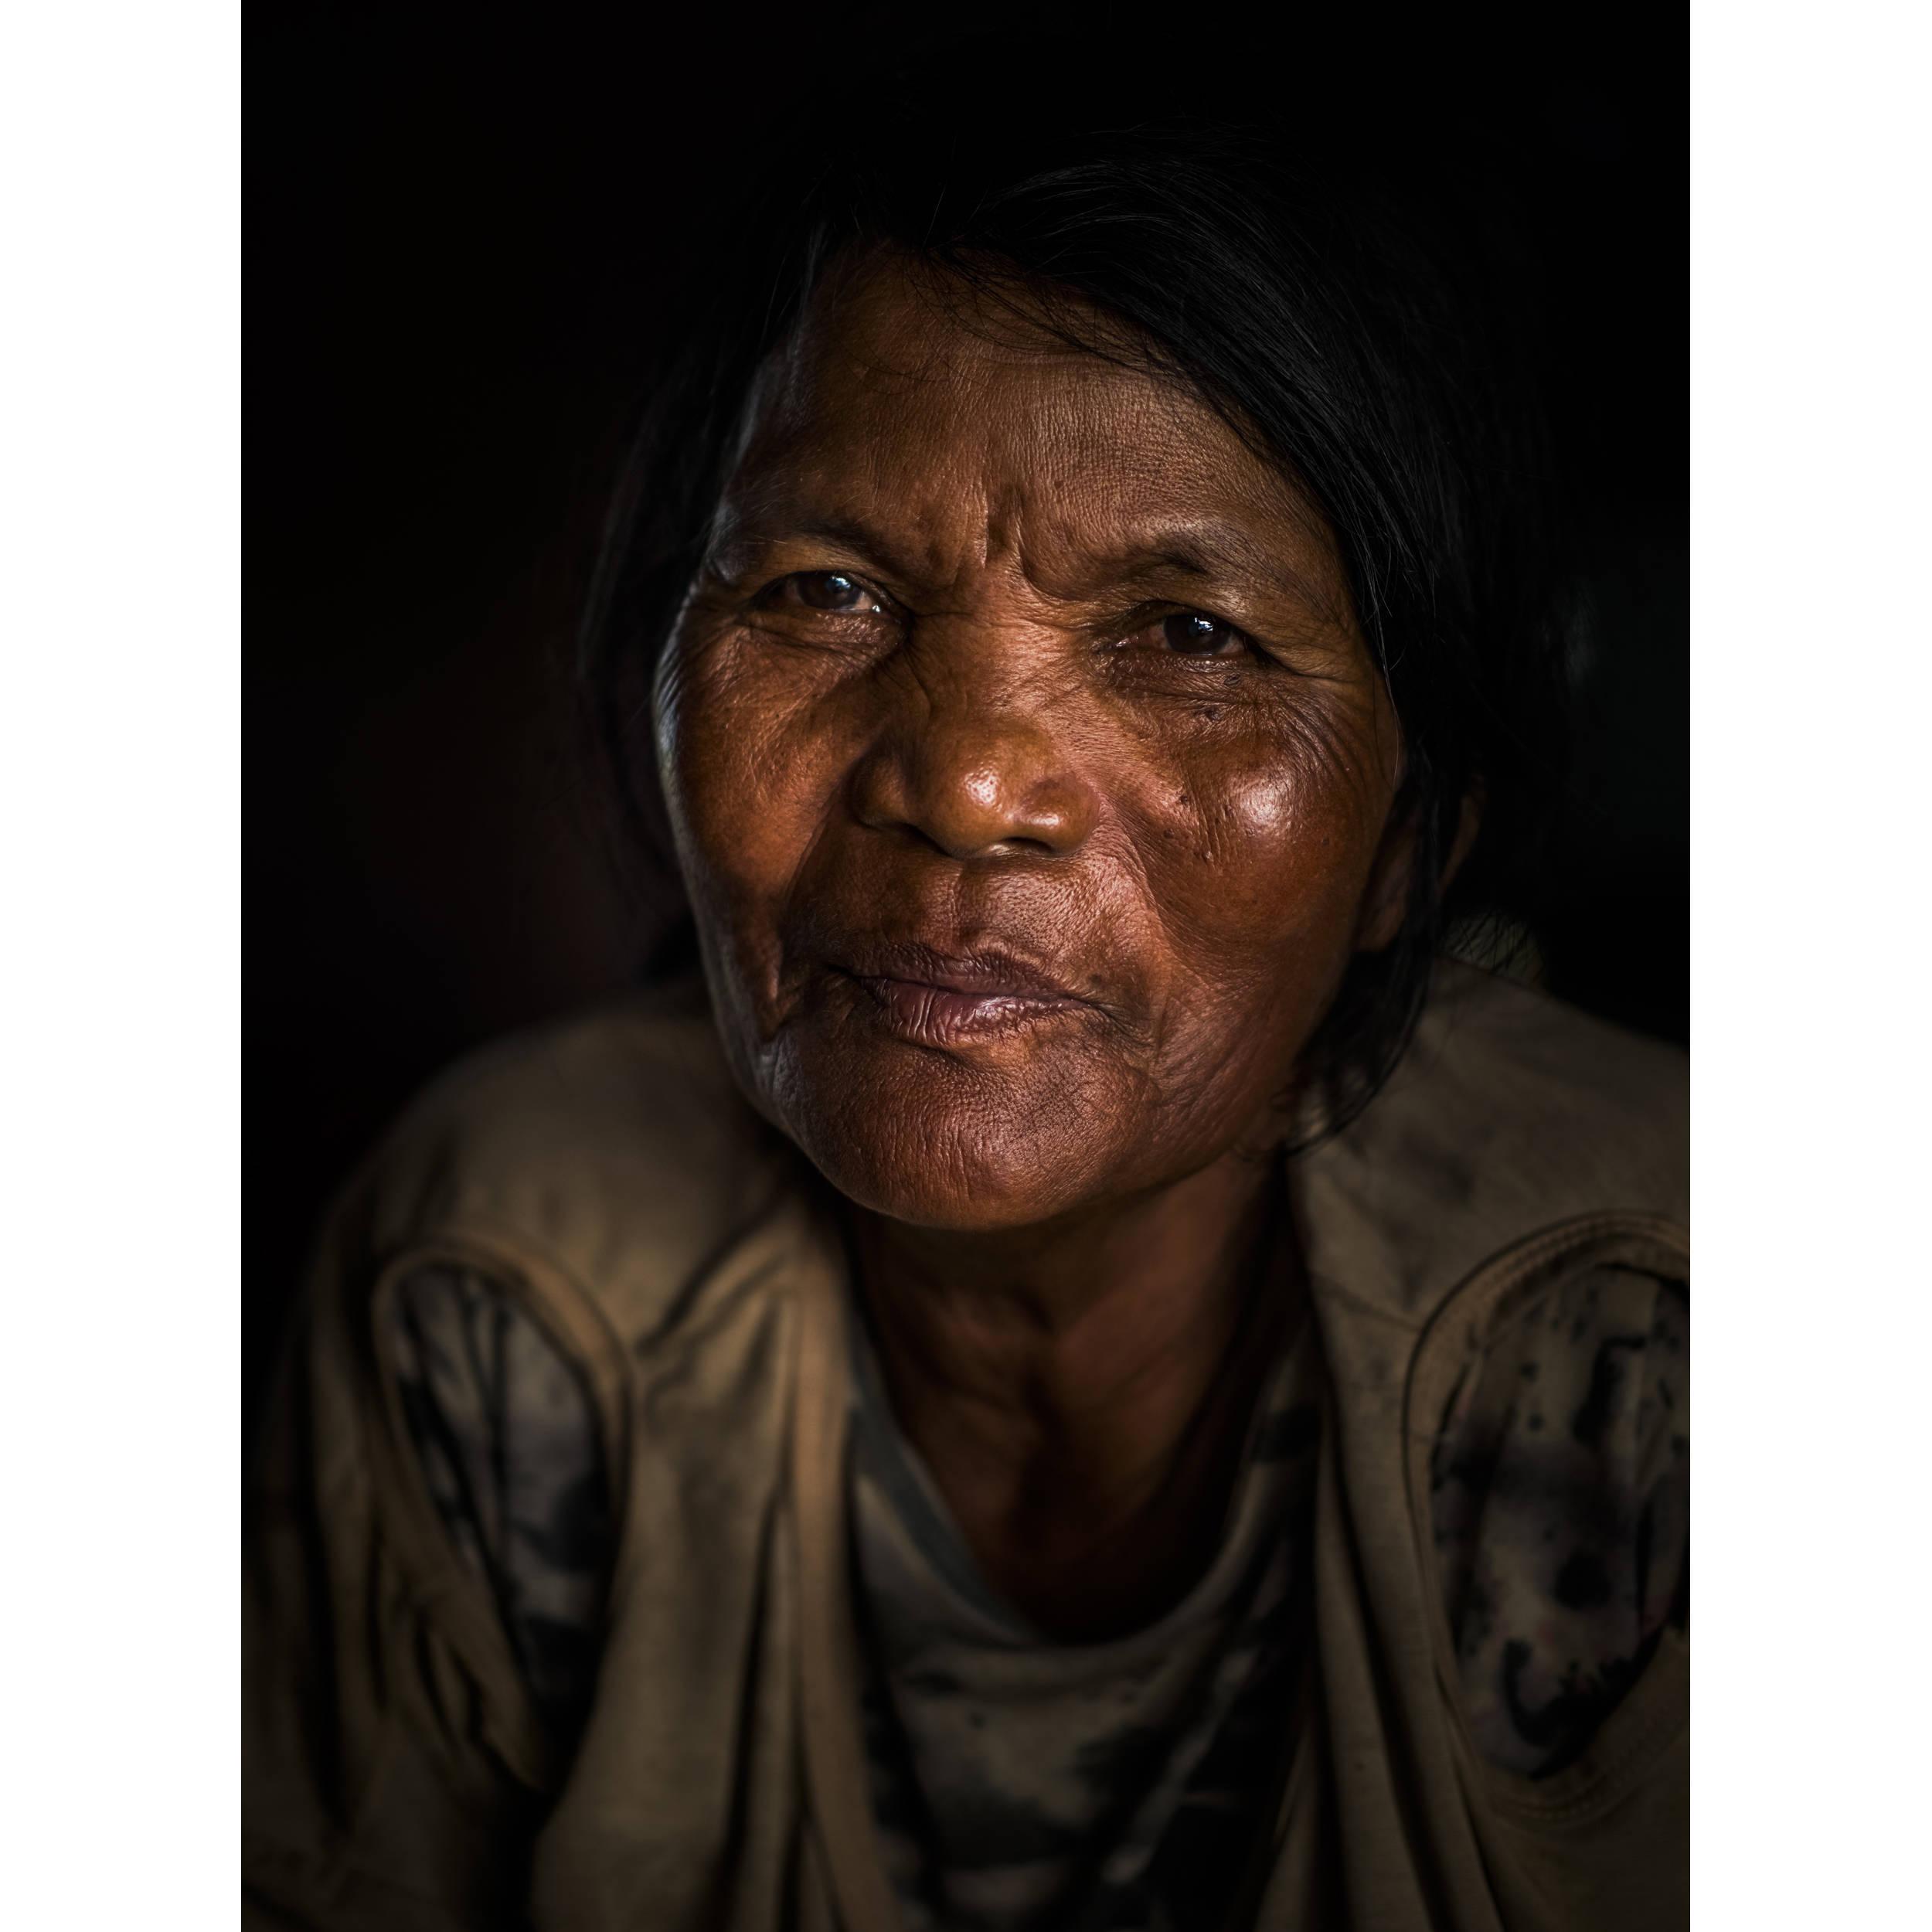 Photographer:Daniel Berehulak - Shot on the Panasonic GH5